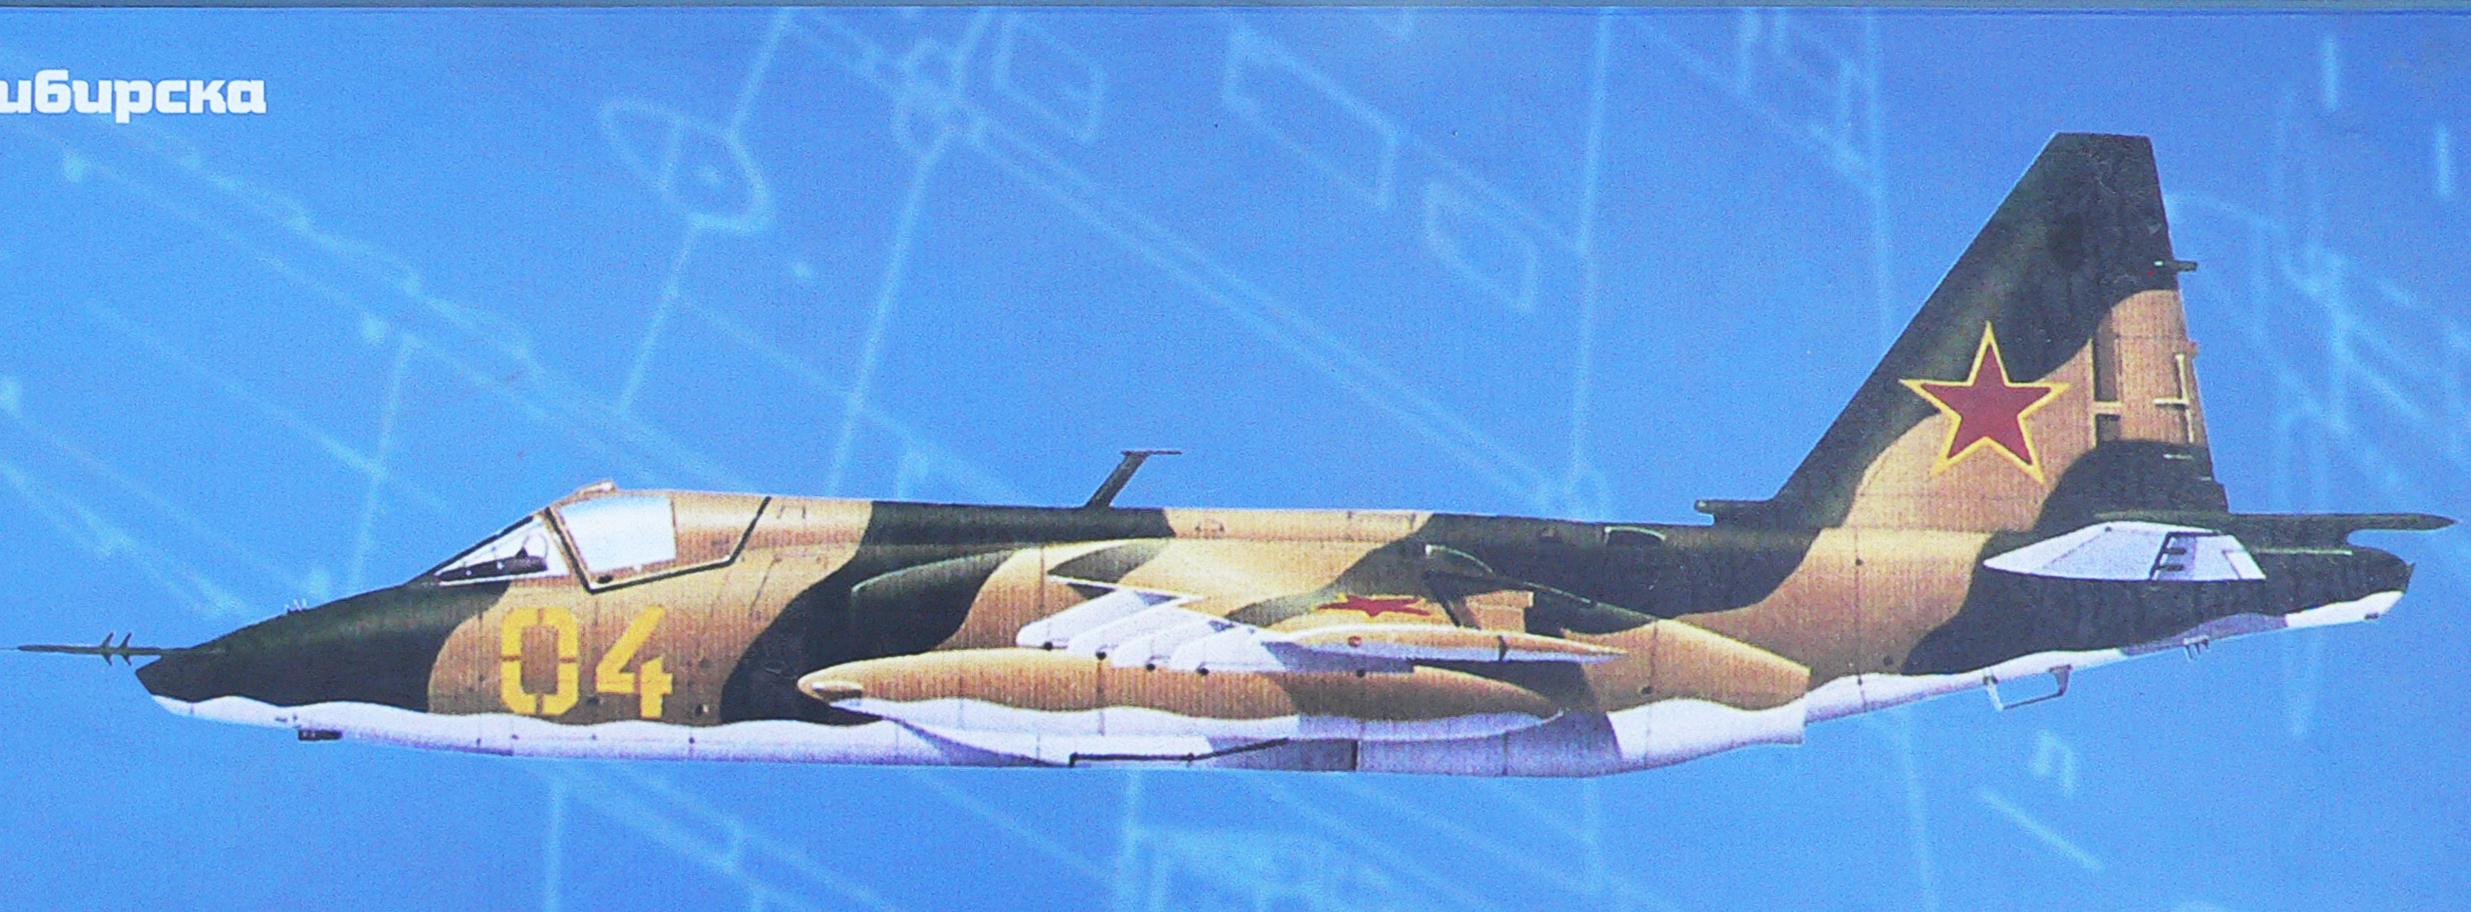 Фотография-самолета-Су25